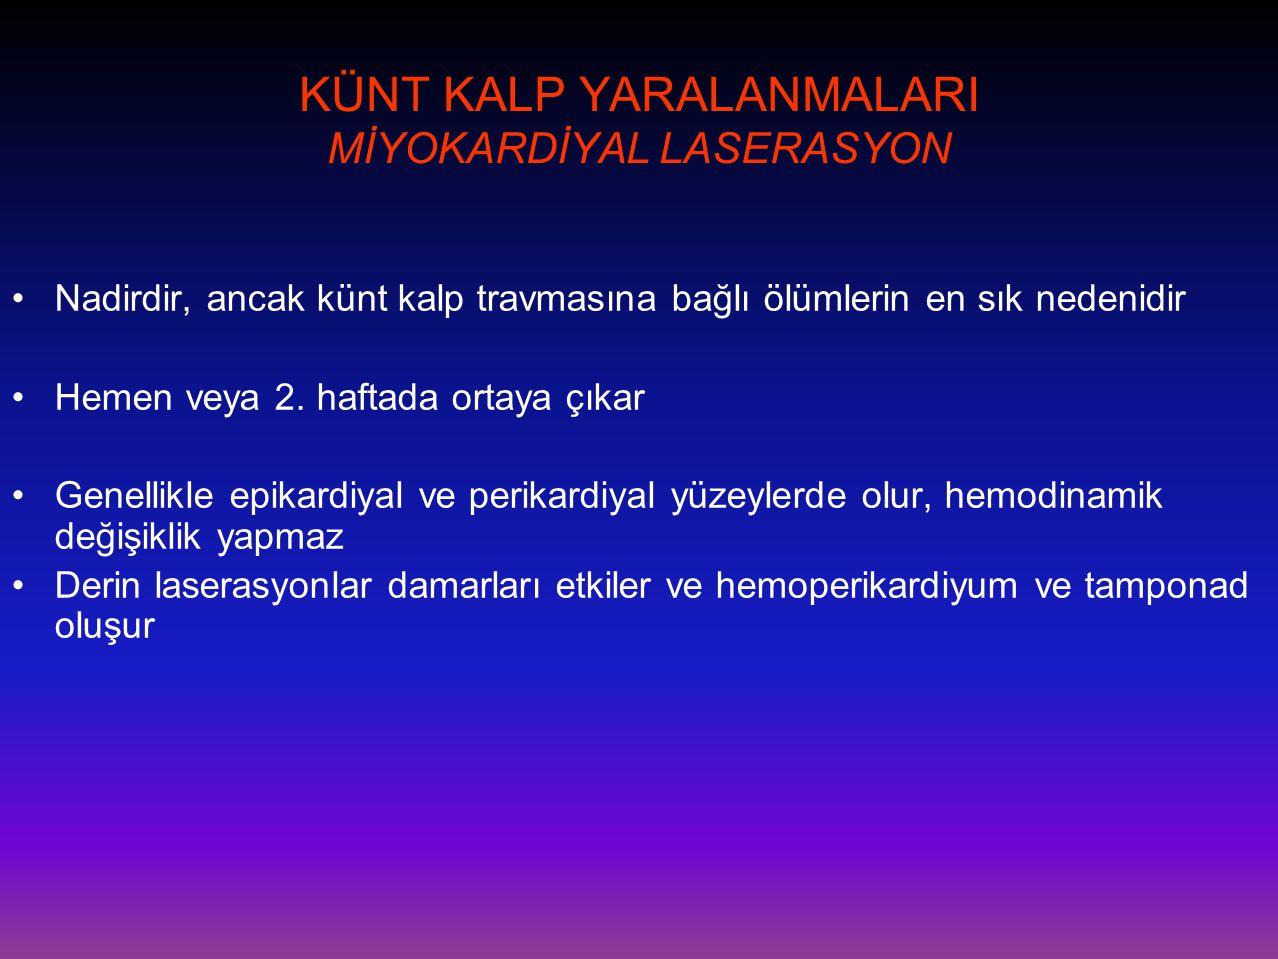 KÜNT KALP YARALANMALARI MİYOKARDİYAL LASERASYON